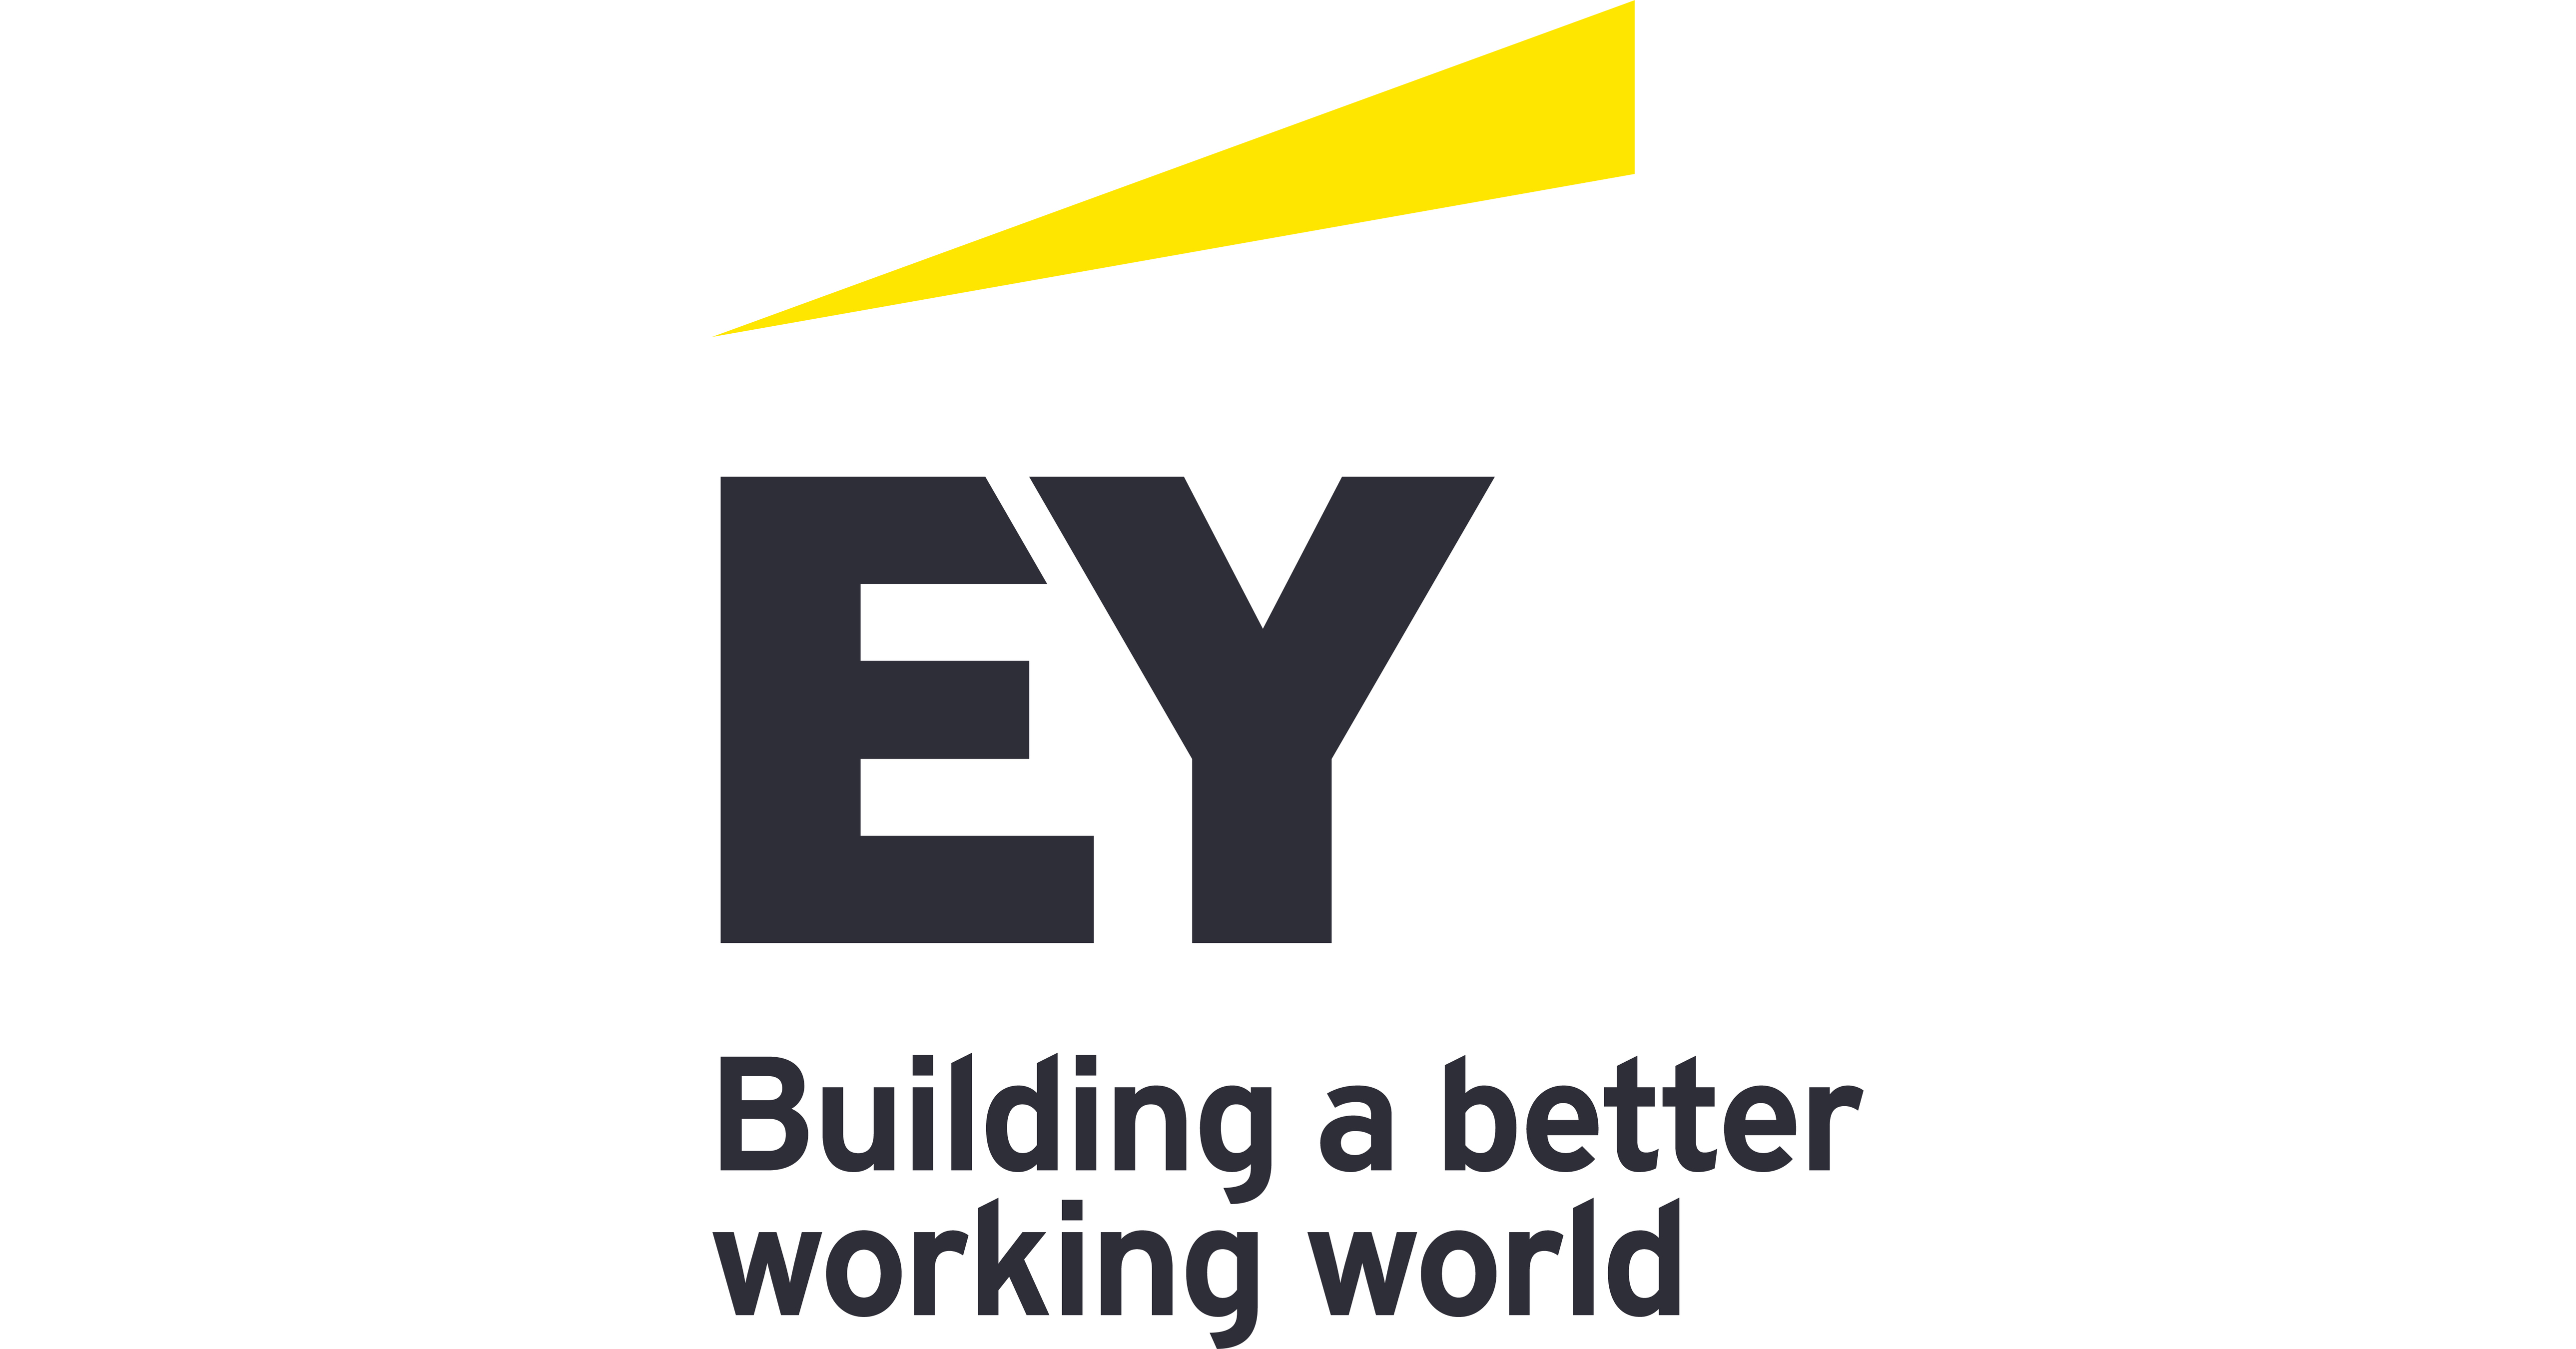 ey logo jpg?p=facebook.